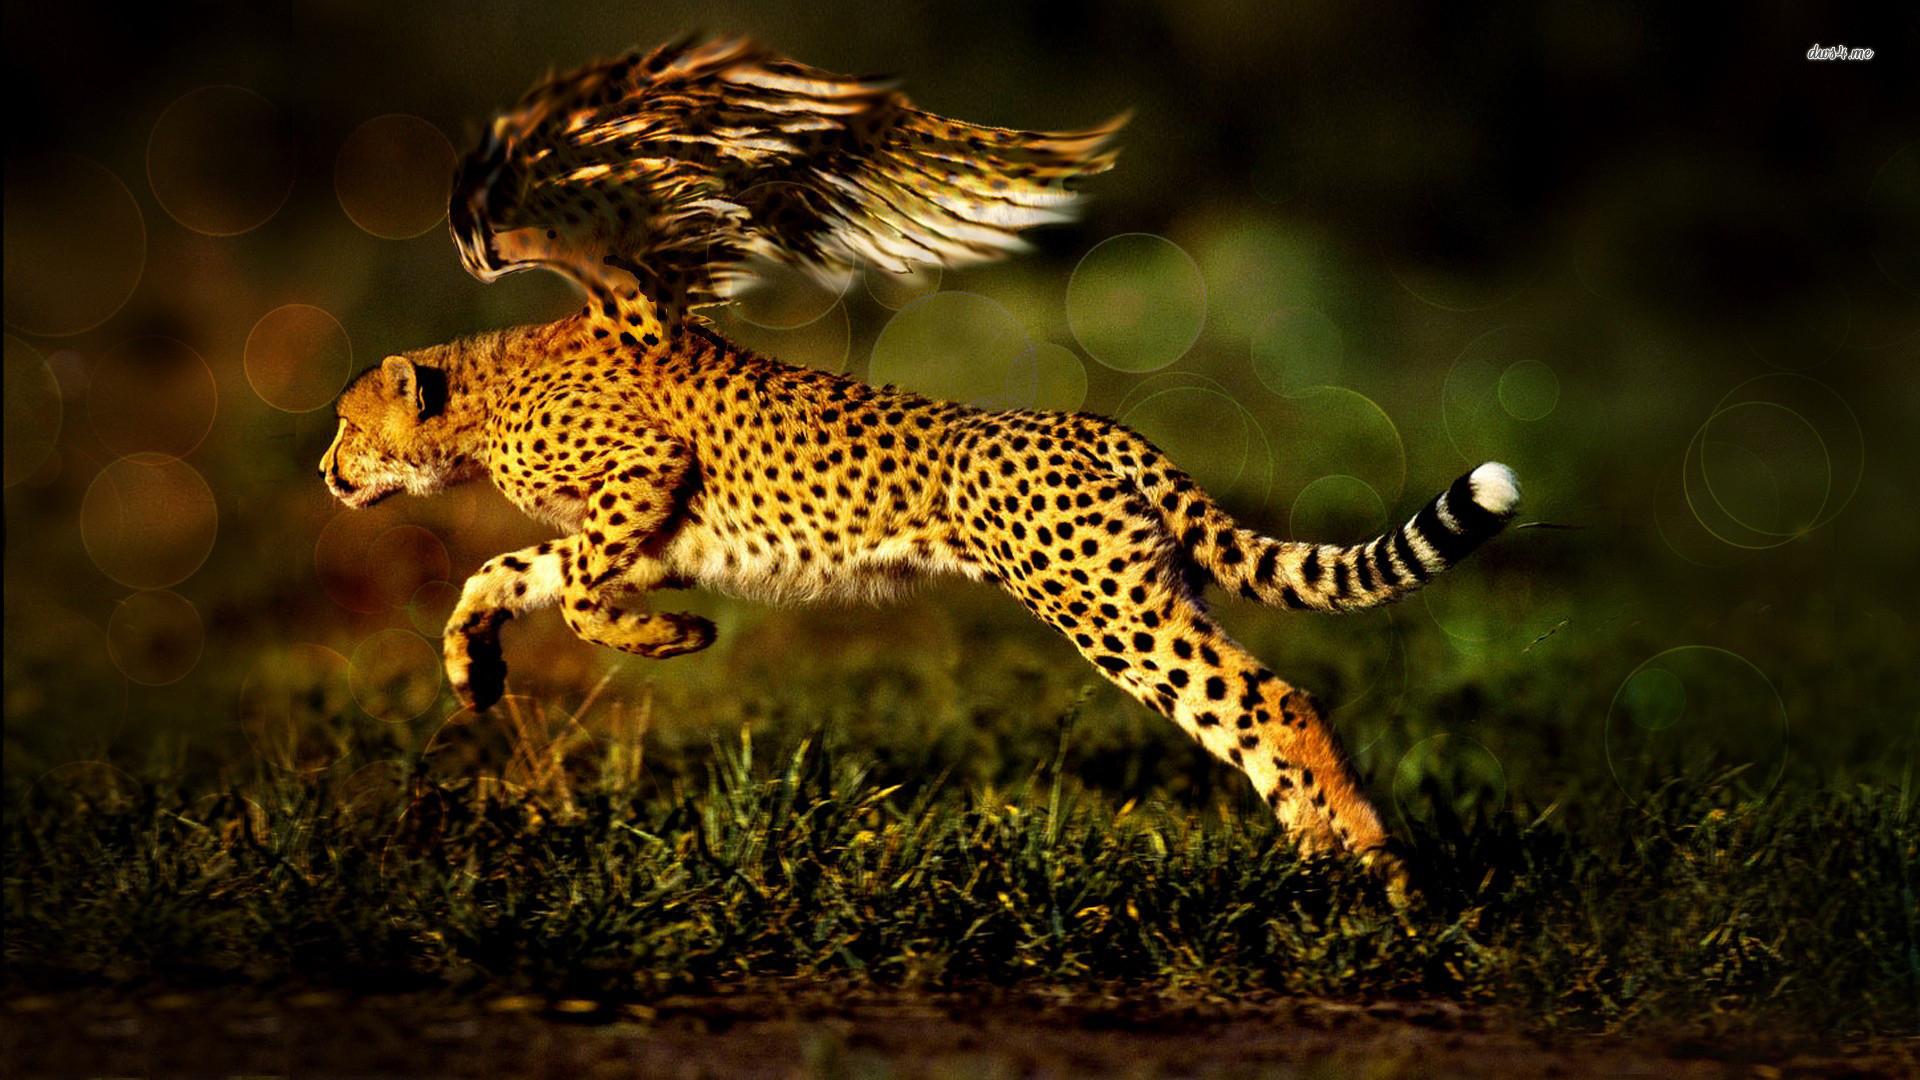 Res: 1920x1080, Fantasy - Cheetah Wallpaper